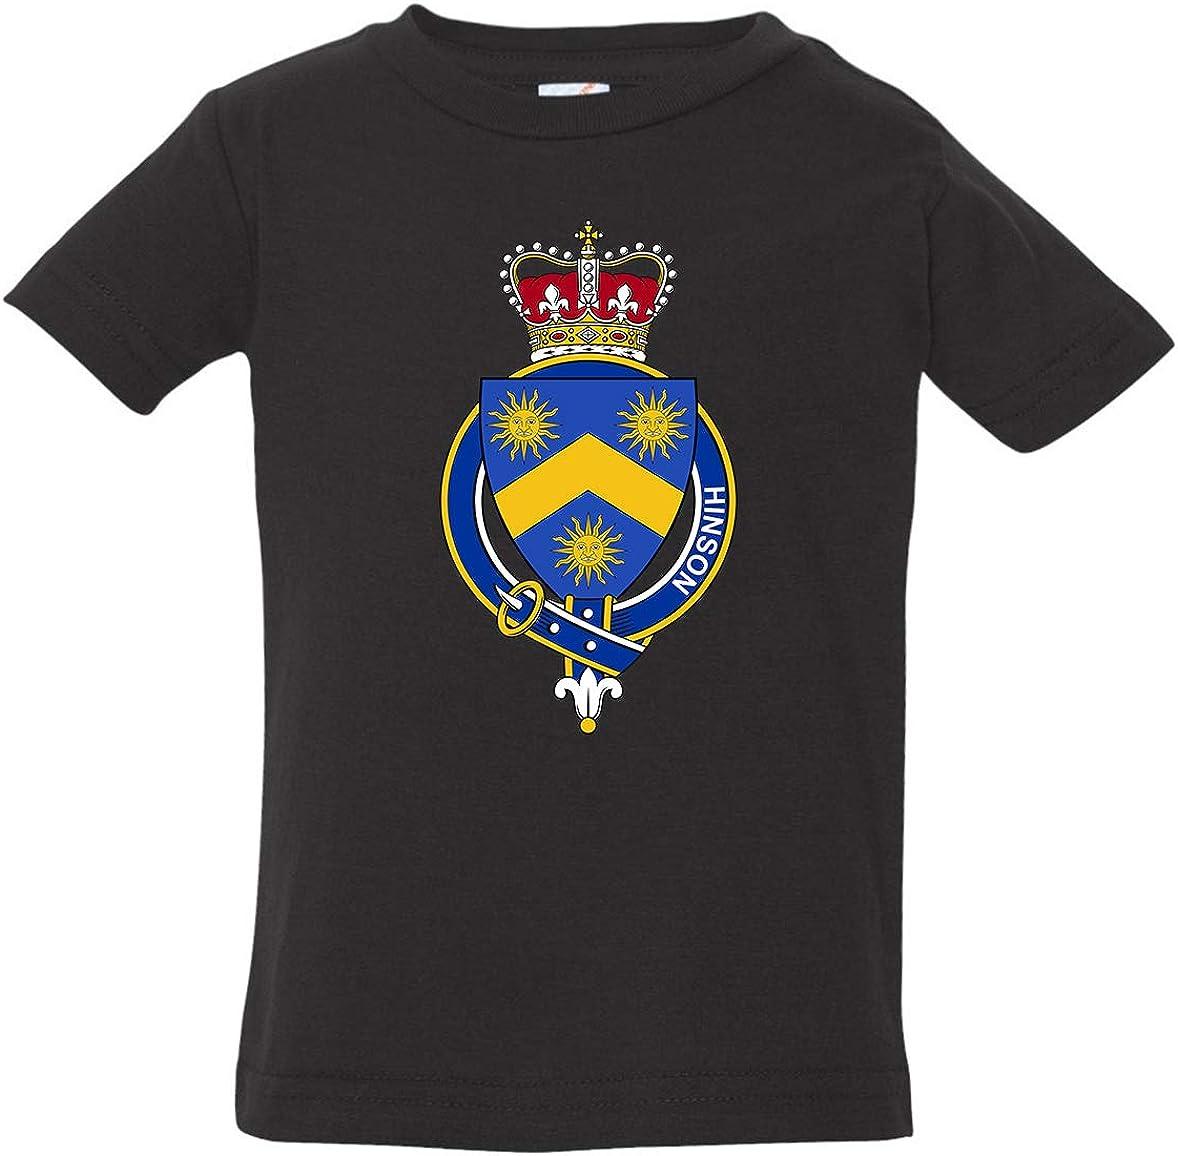 Tenacitee Babys English Garter Family Hinson Shirt